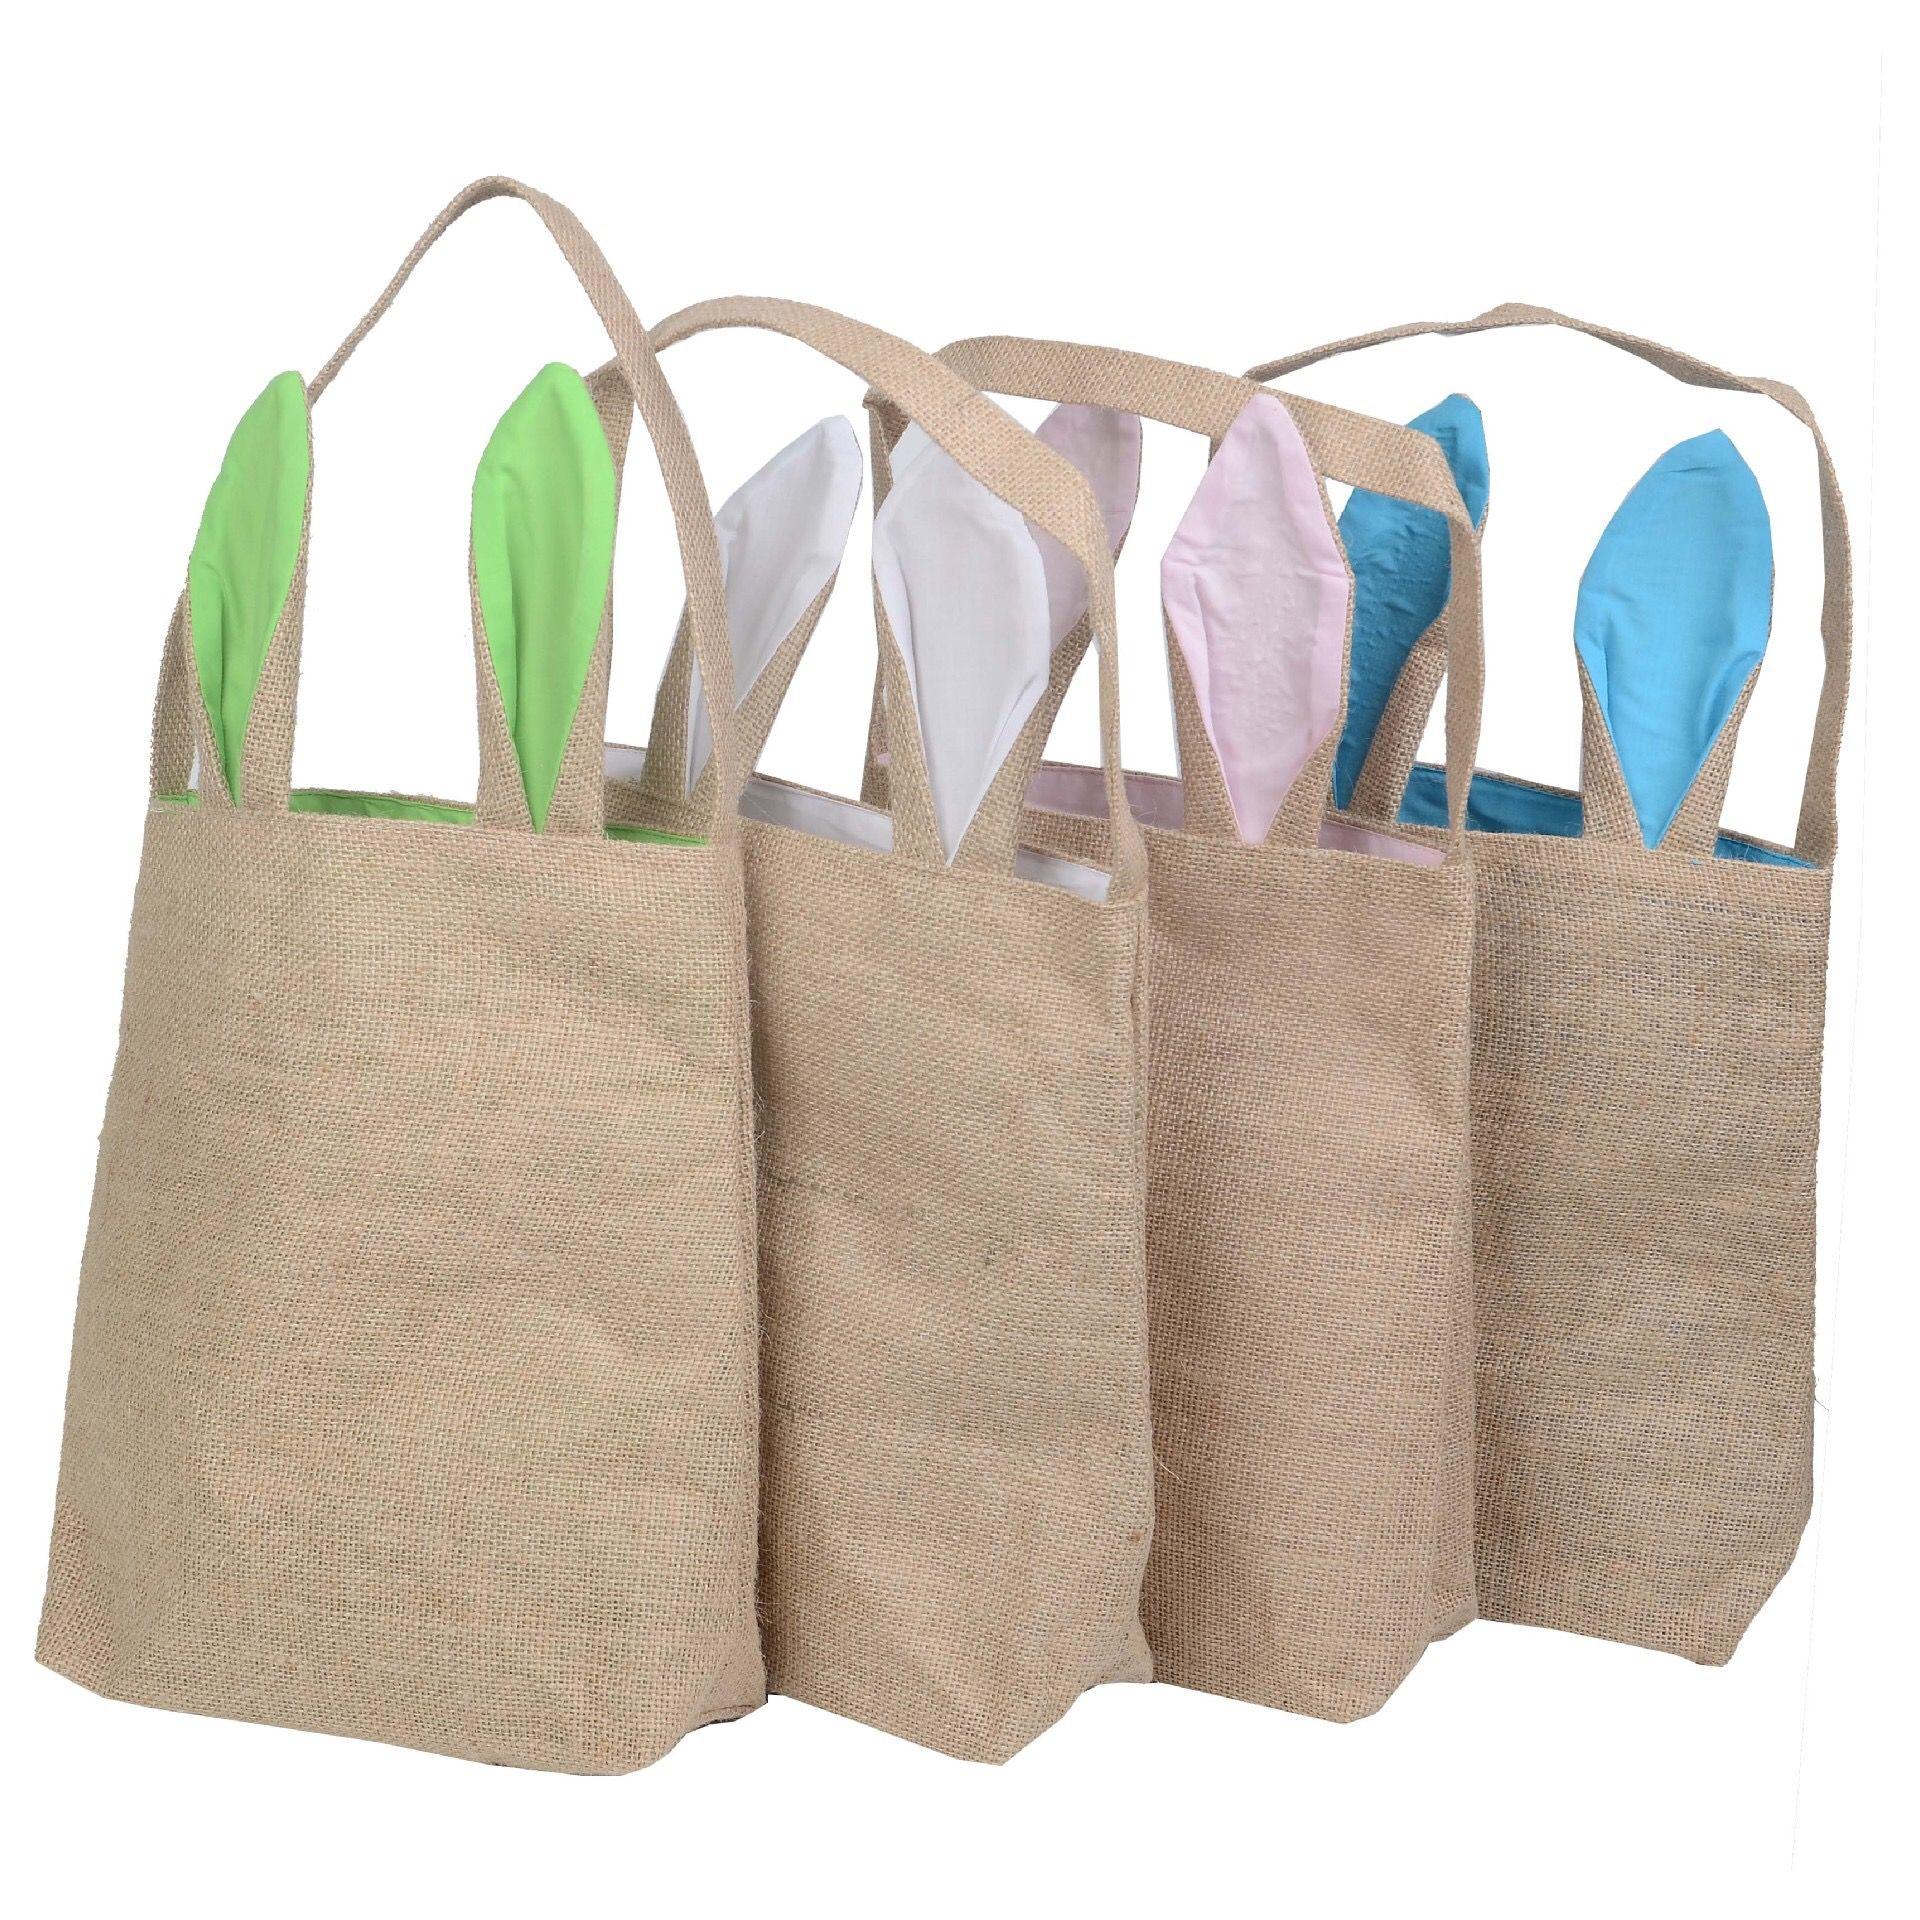 e4a9d54078e8 Wholesale Beautiful Reusable Foldable Canvas Shopping Bag Fashion Easter  Day Gift Cotton Linen Tote Bunny Bag Luxury Handbags Handbags Brands From  ...